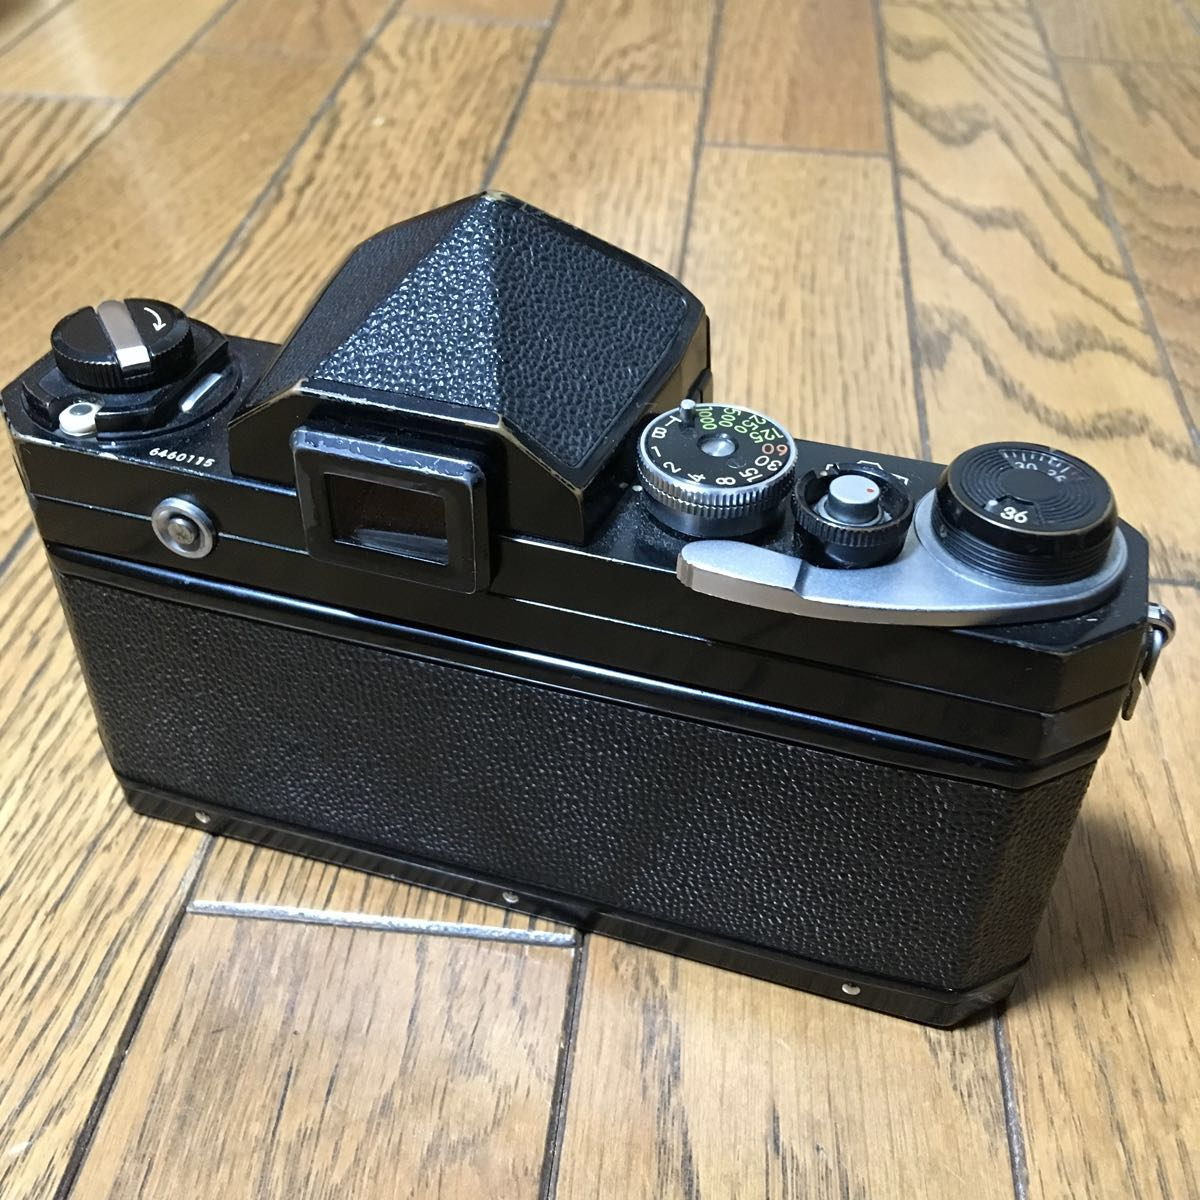 Nikon F アイレベル ブラック ボディ 646万台 前期型 動作確認済みです。_画像5